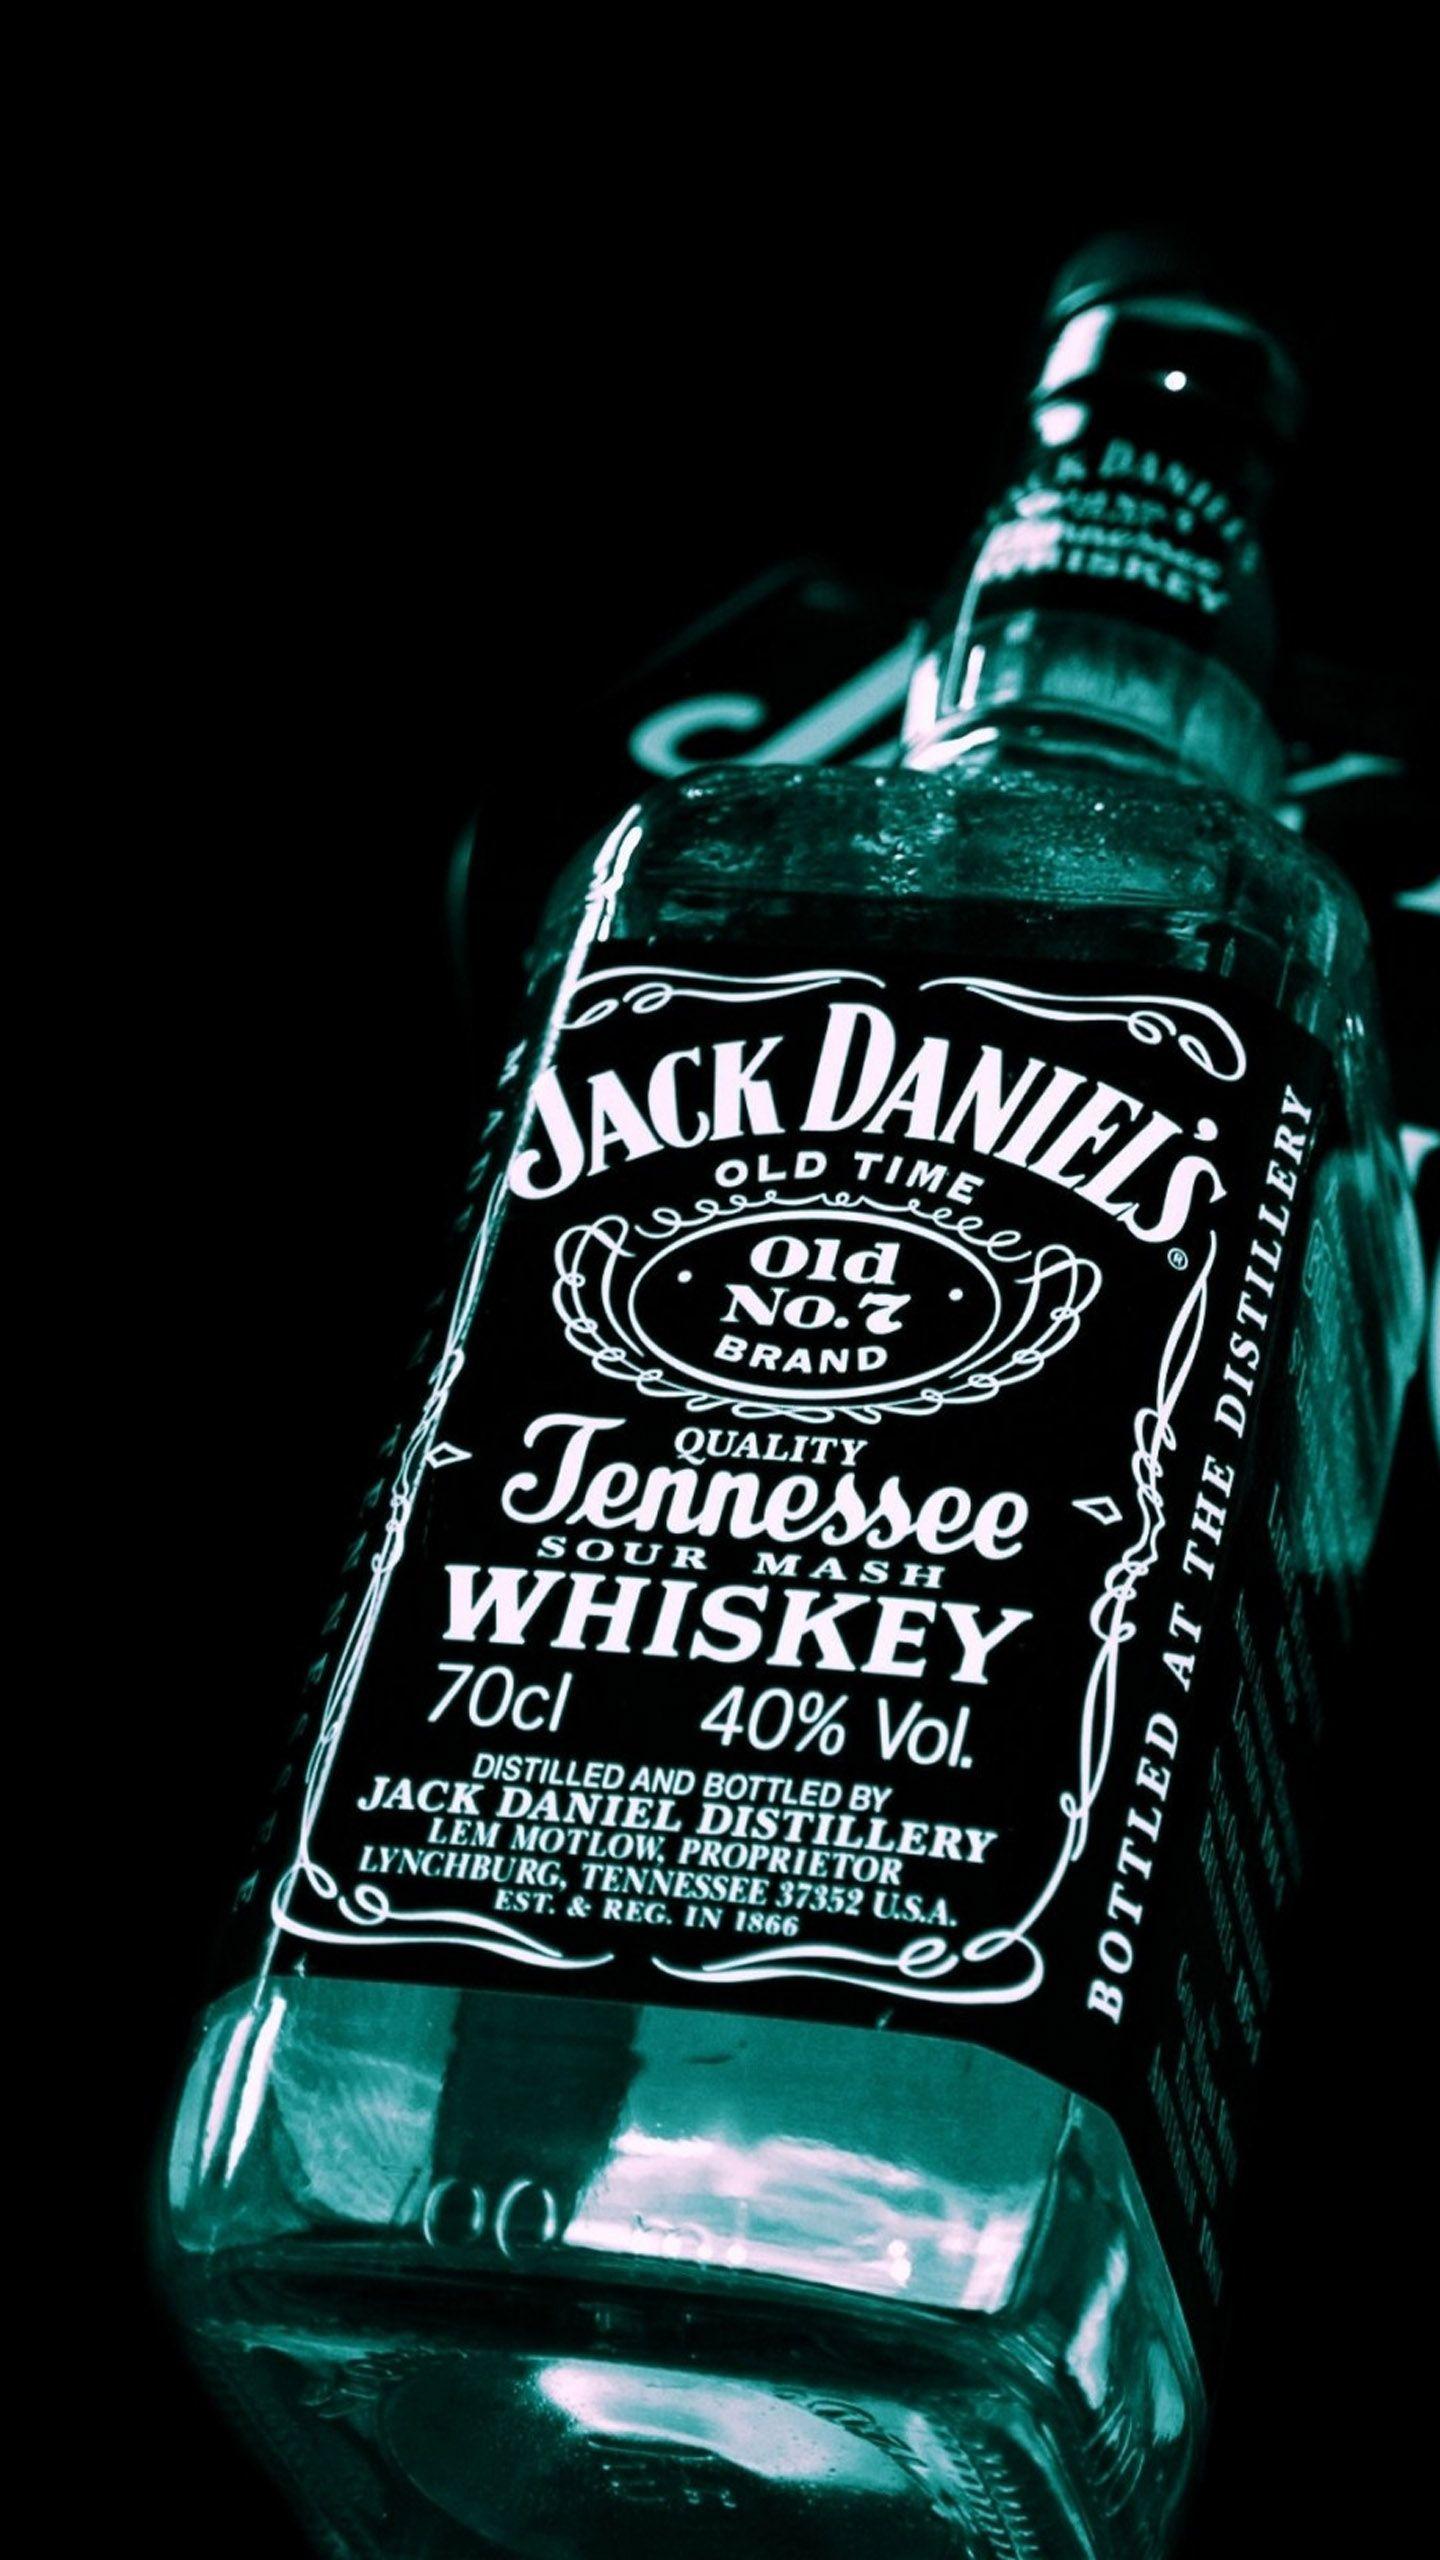 Jack Daniels Whiskey Brandy Bottle Wallpaper Jpg 1440 2560